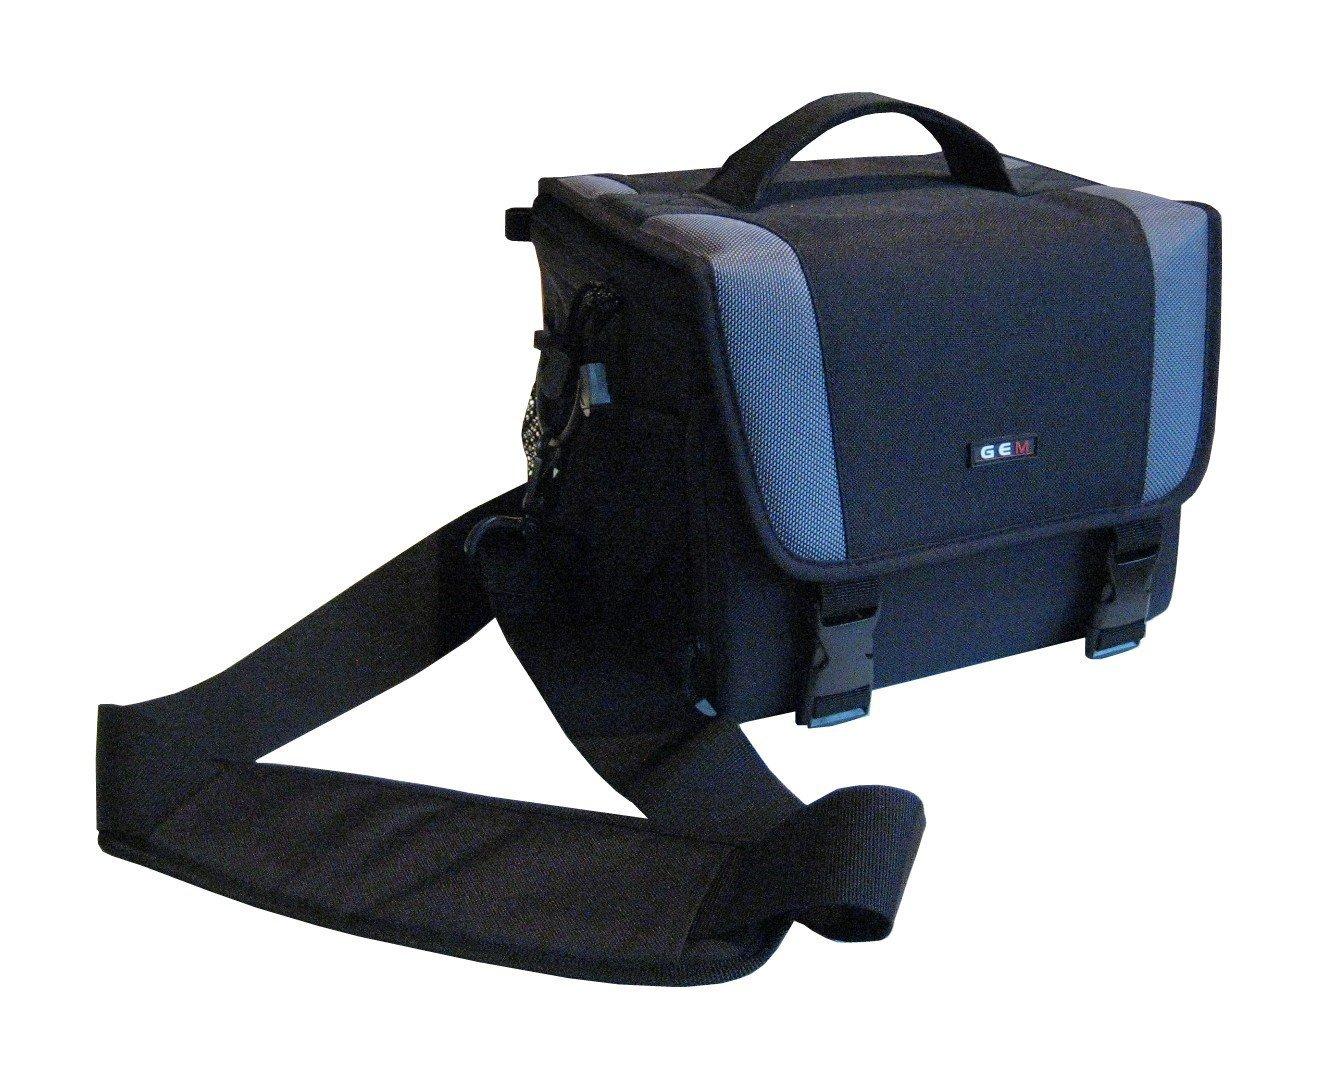 Gem SLR bolsa de hombro/funda para Gem - Bolso bandolera/funda ...